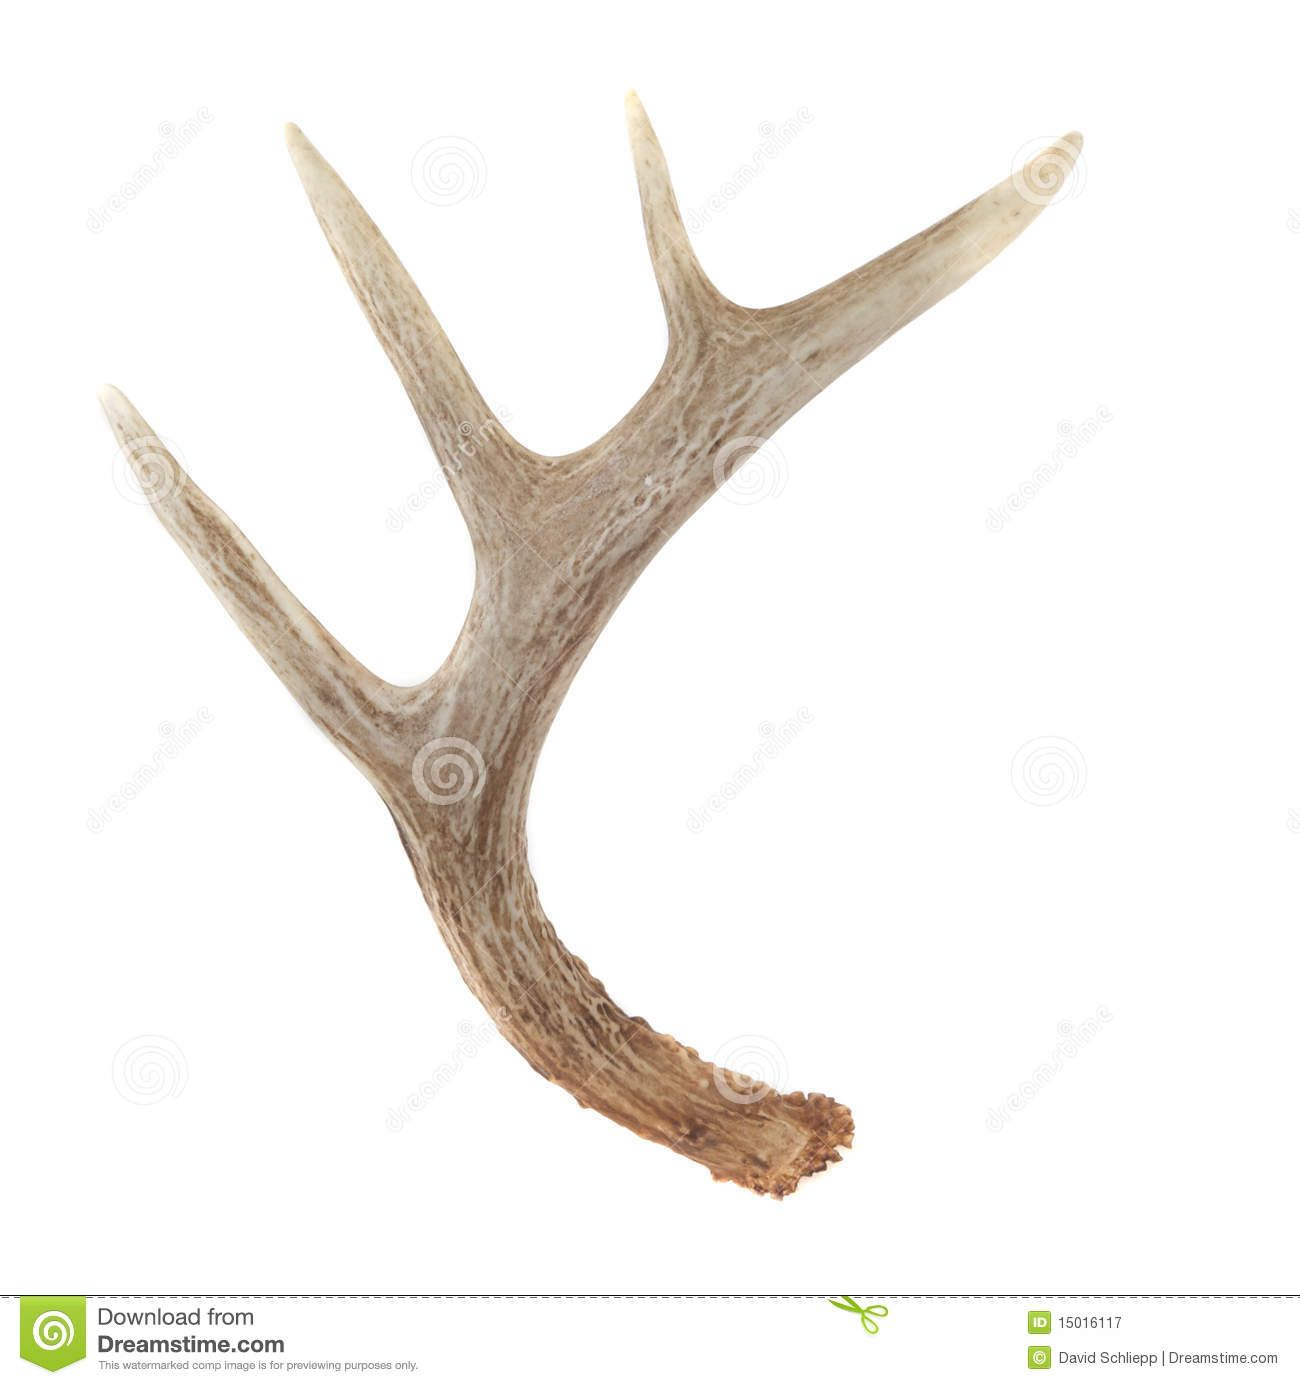 1300x1385 Pix Gt Whitetail Deer Antlers Drawing Inspiration